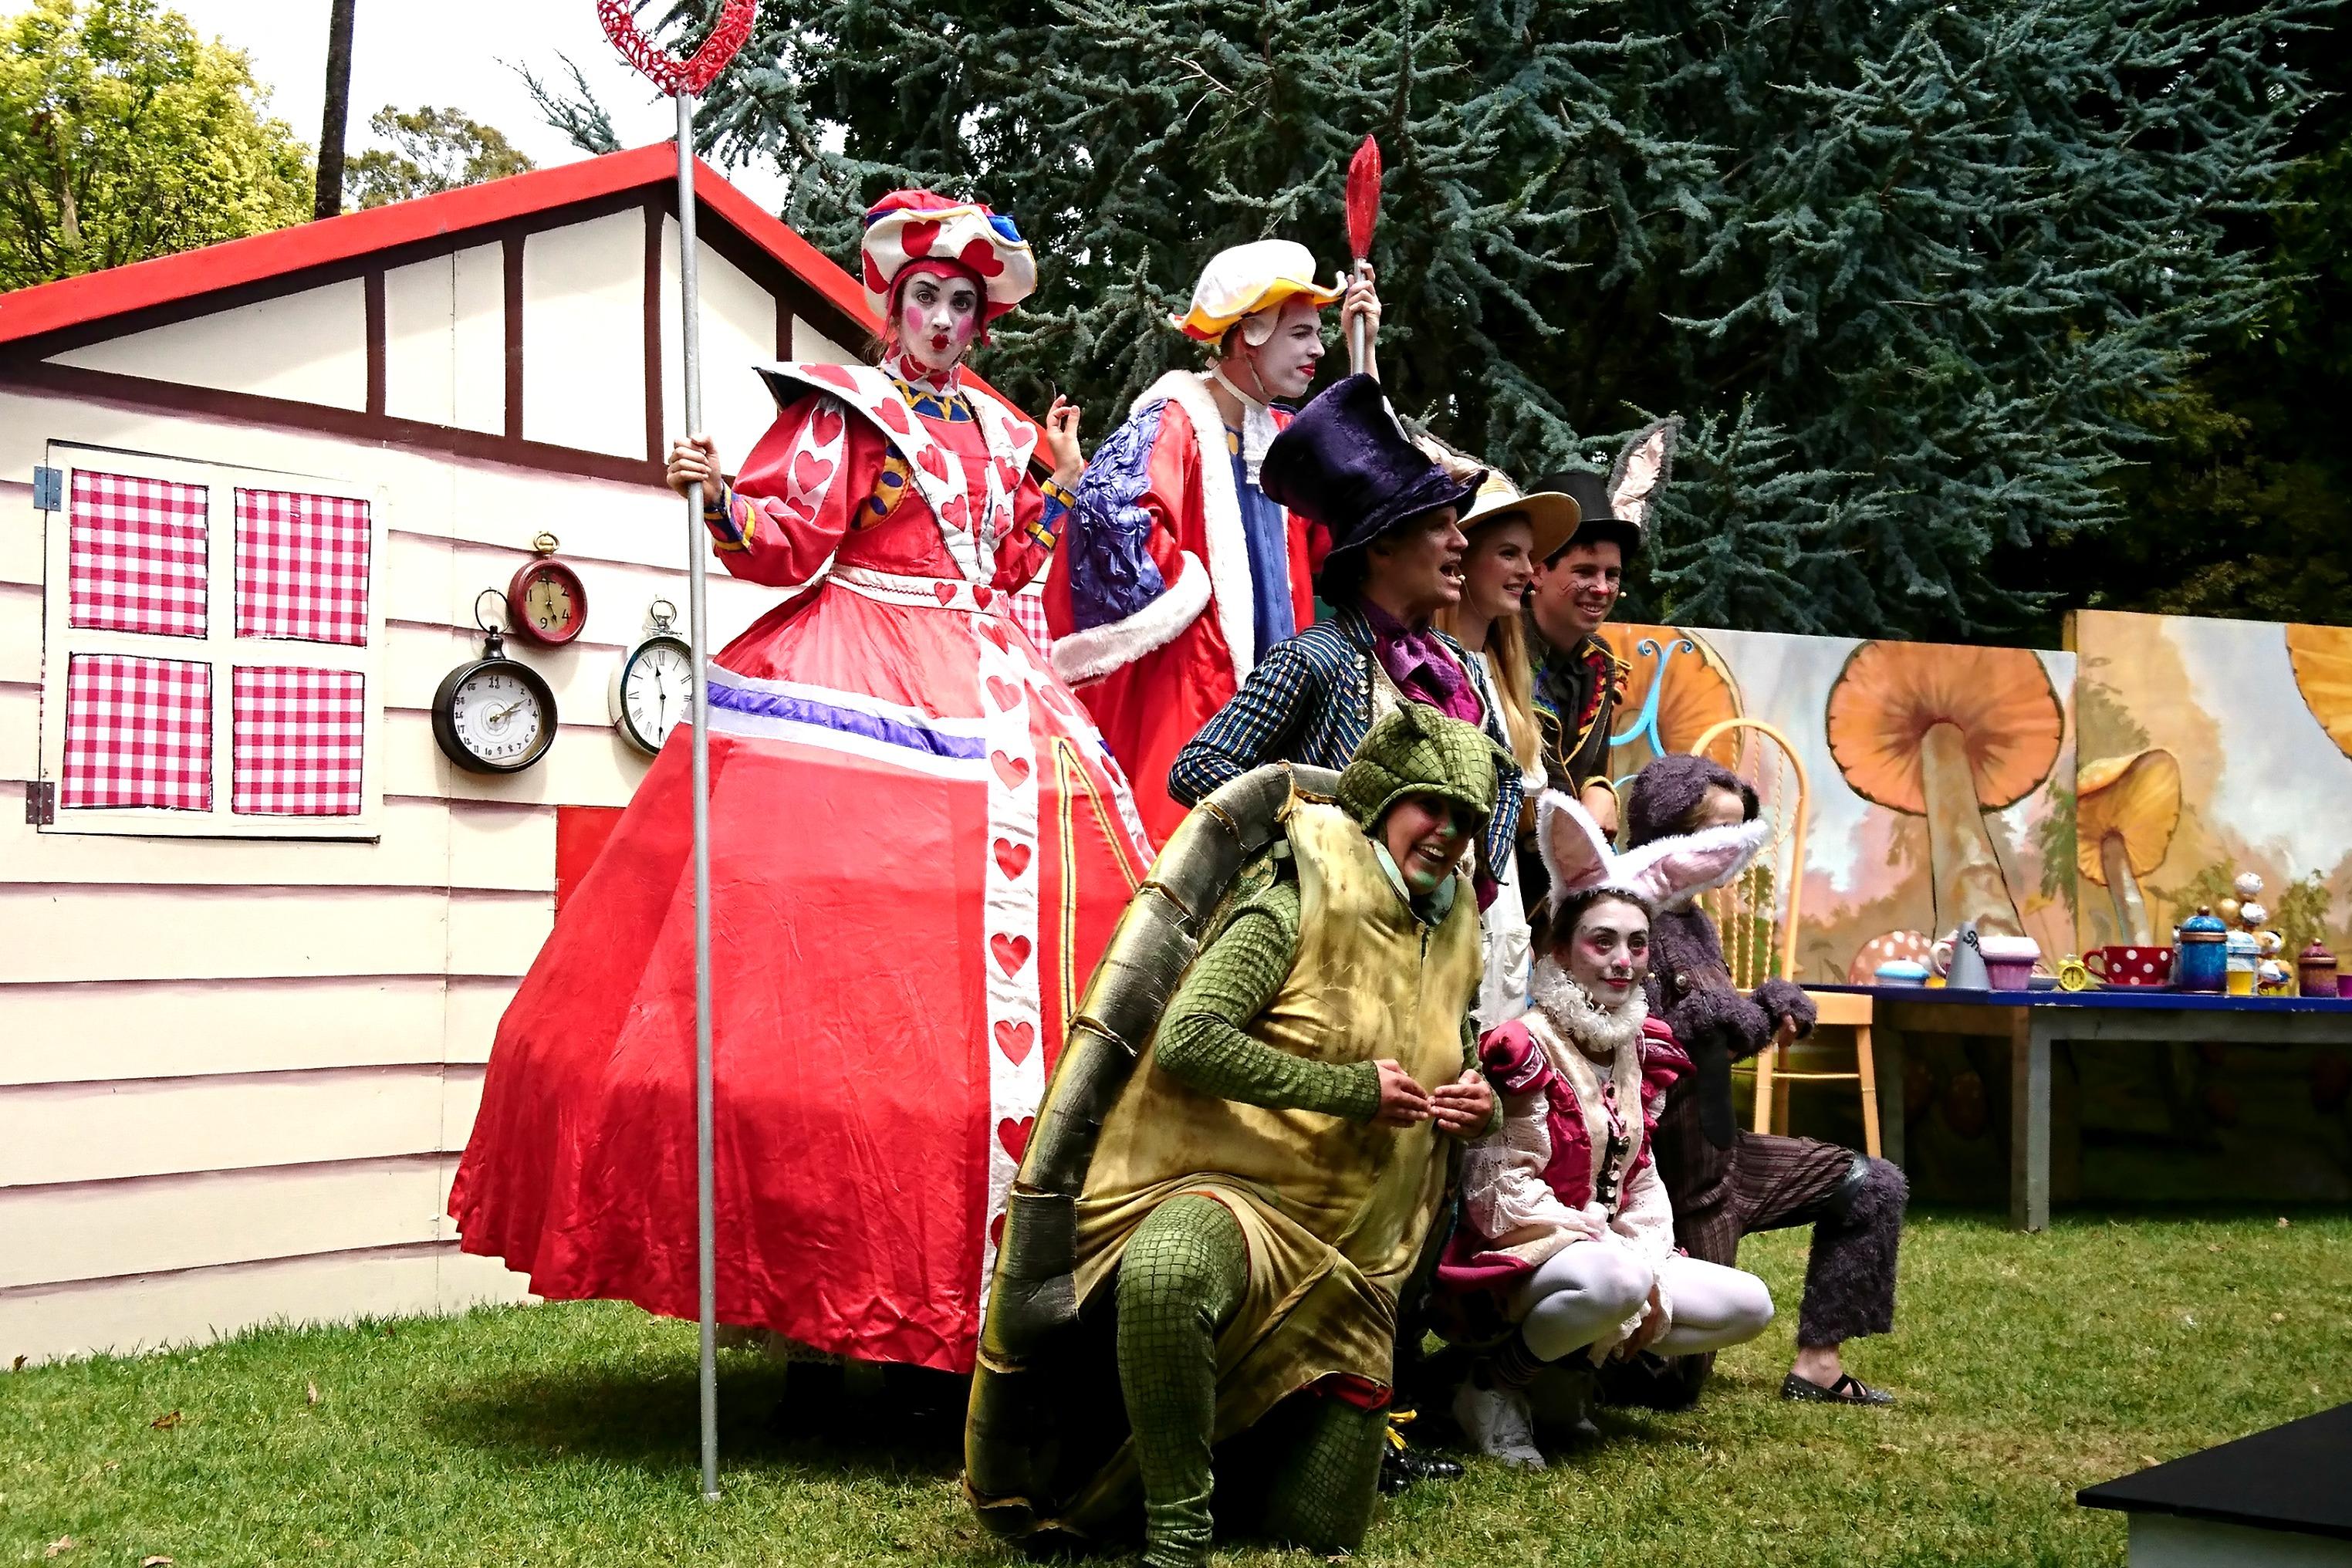 Alice in Wonderland 2 & Alice in Wonderland u2013 The Australian Shakespeare Company u2013 Kidding ...